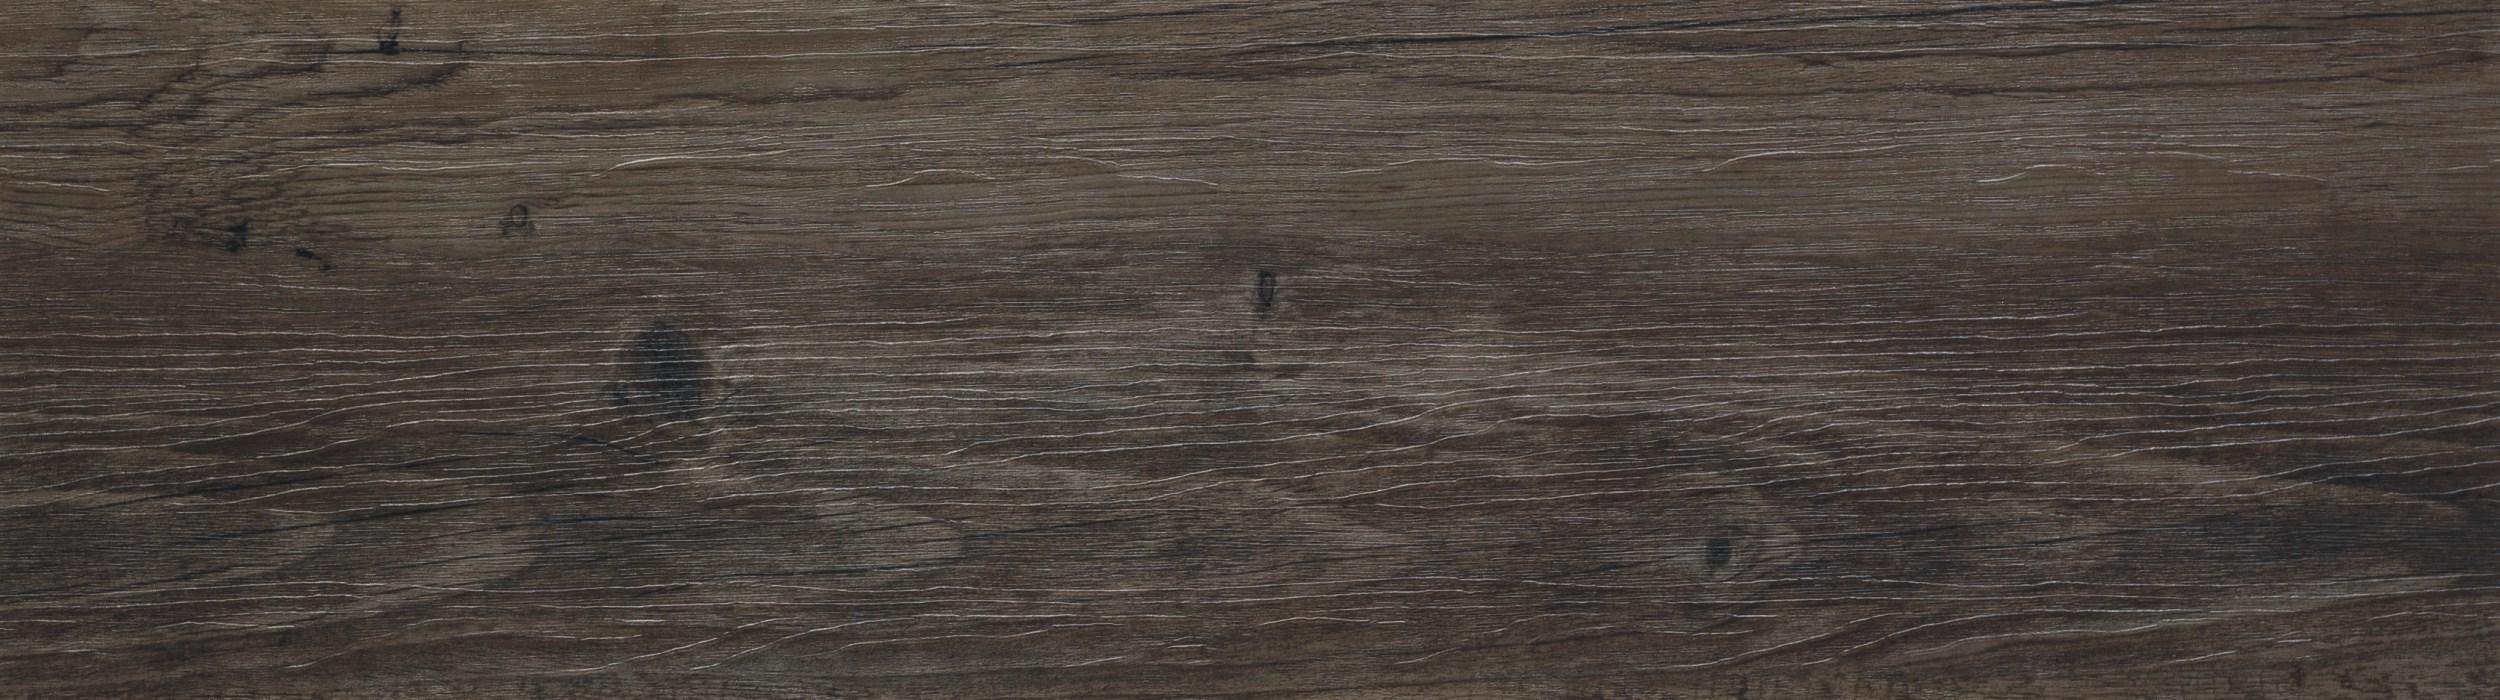 quadratmeterpreis laminat fliesen. Black Bedroom Furniture Sets. Home Design Ideas